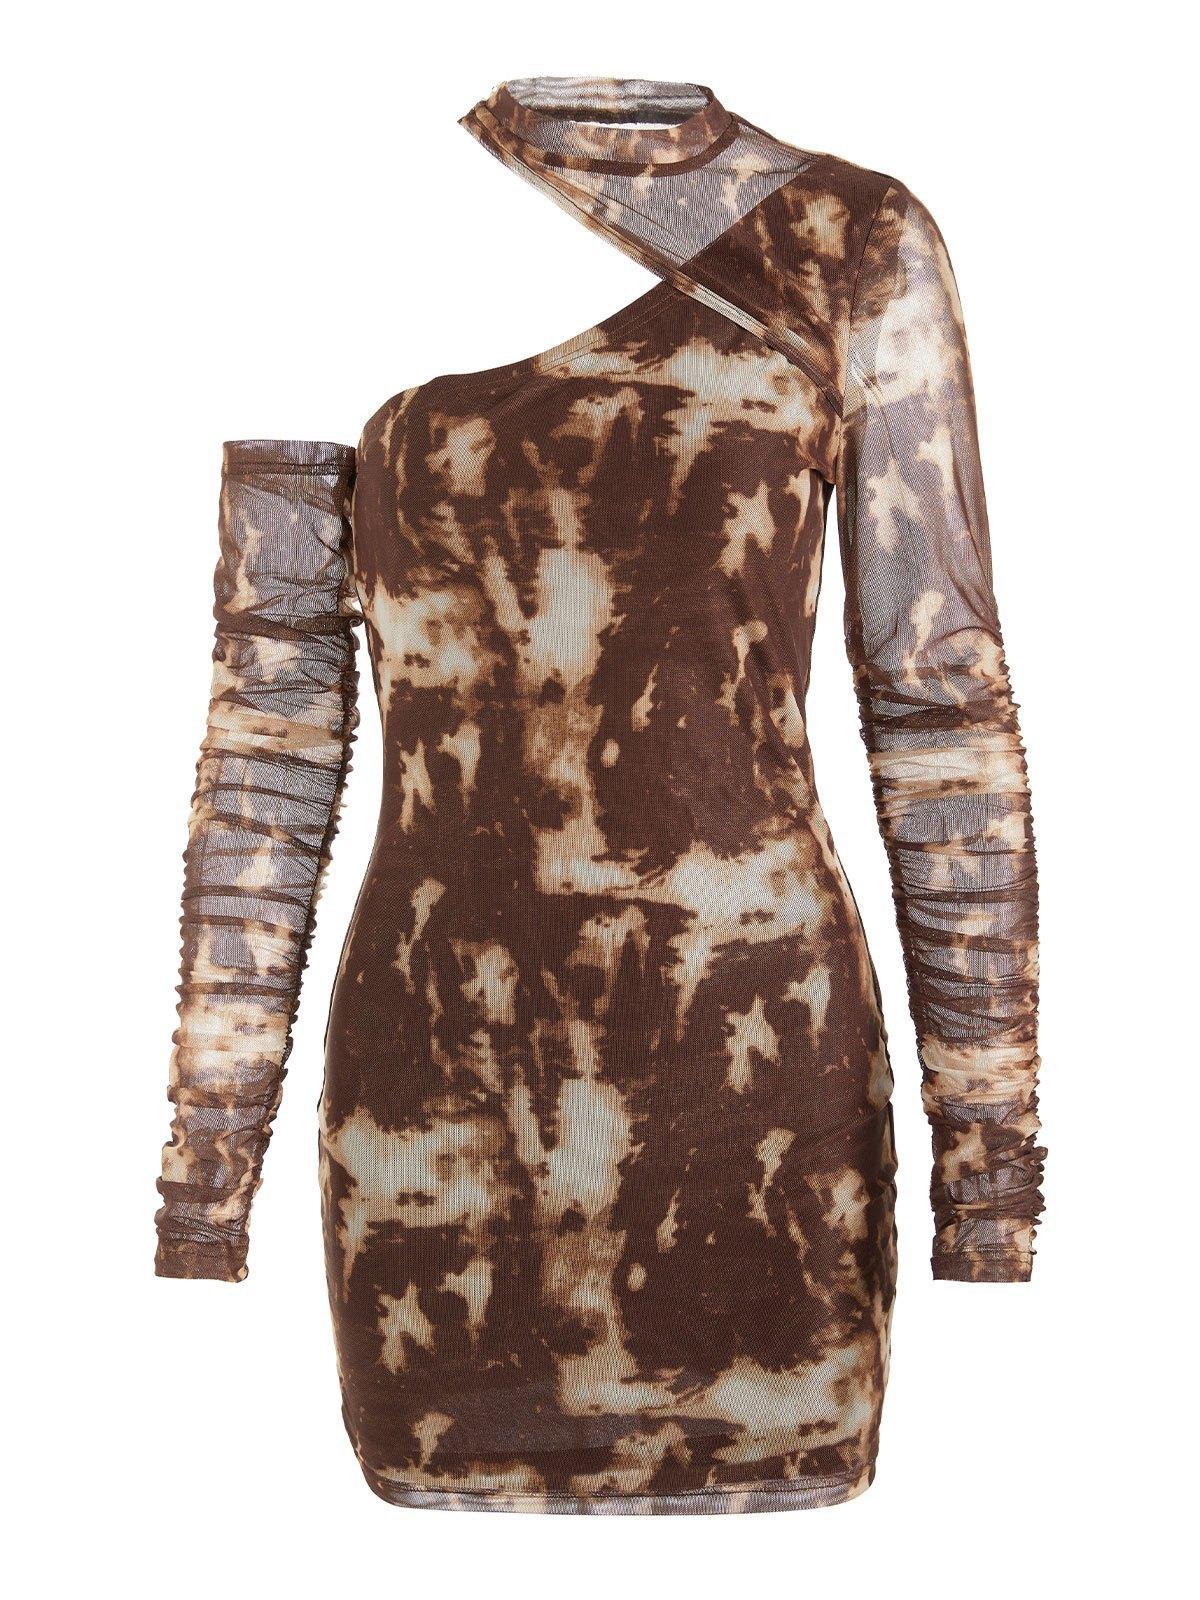 EMMIOL Cutout Tie Dye Long Sleeve Midi Dress - Brown M